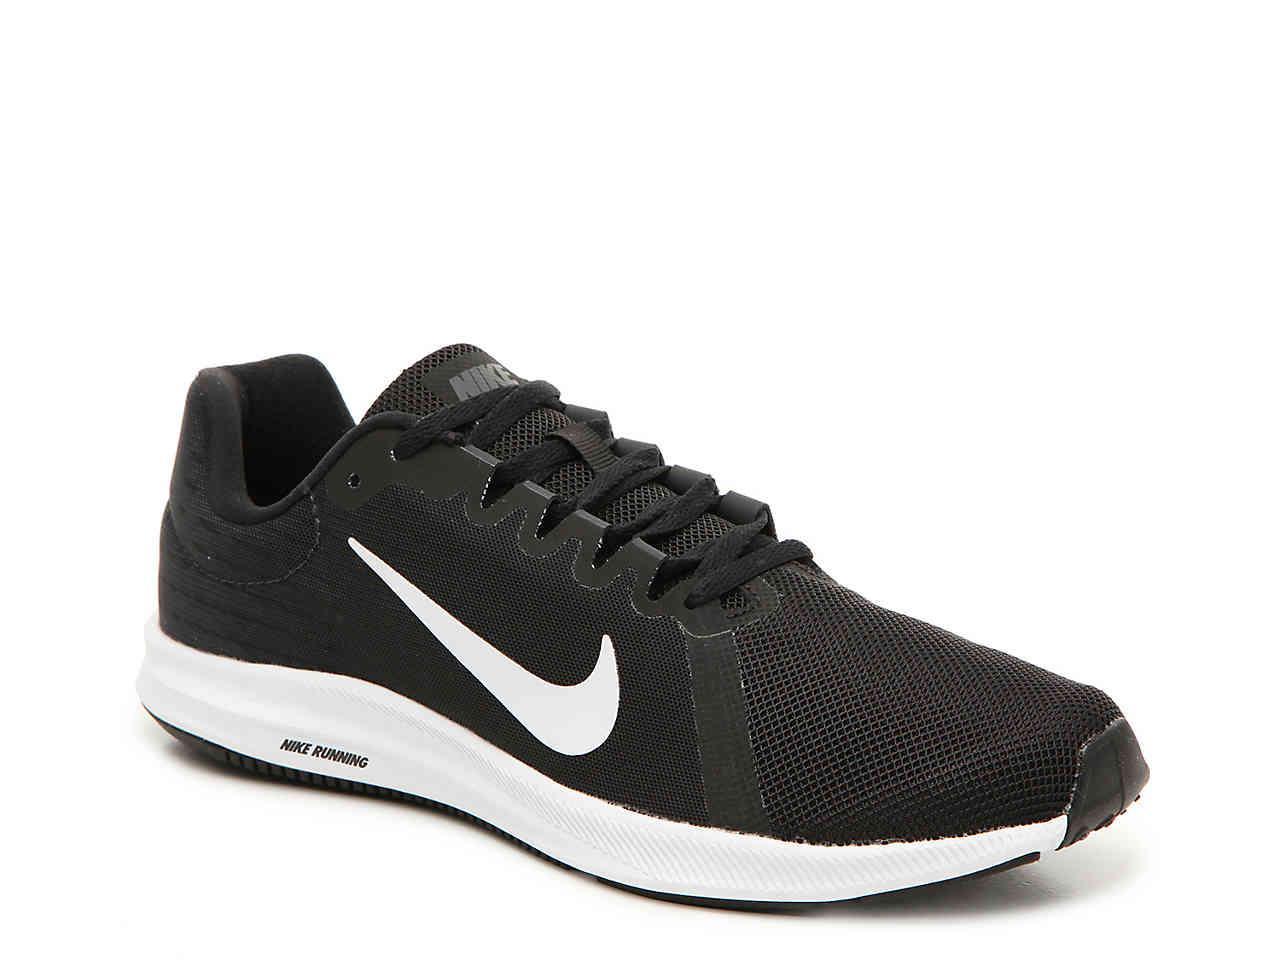 431b18d277b10 Lyst - Nike Downshifter 8 Lightweight Running Shoe in Black for Men